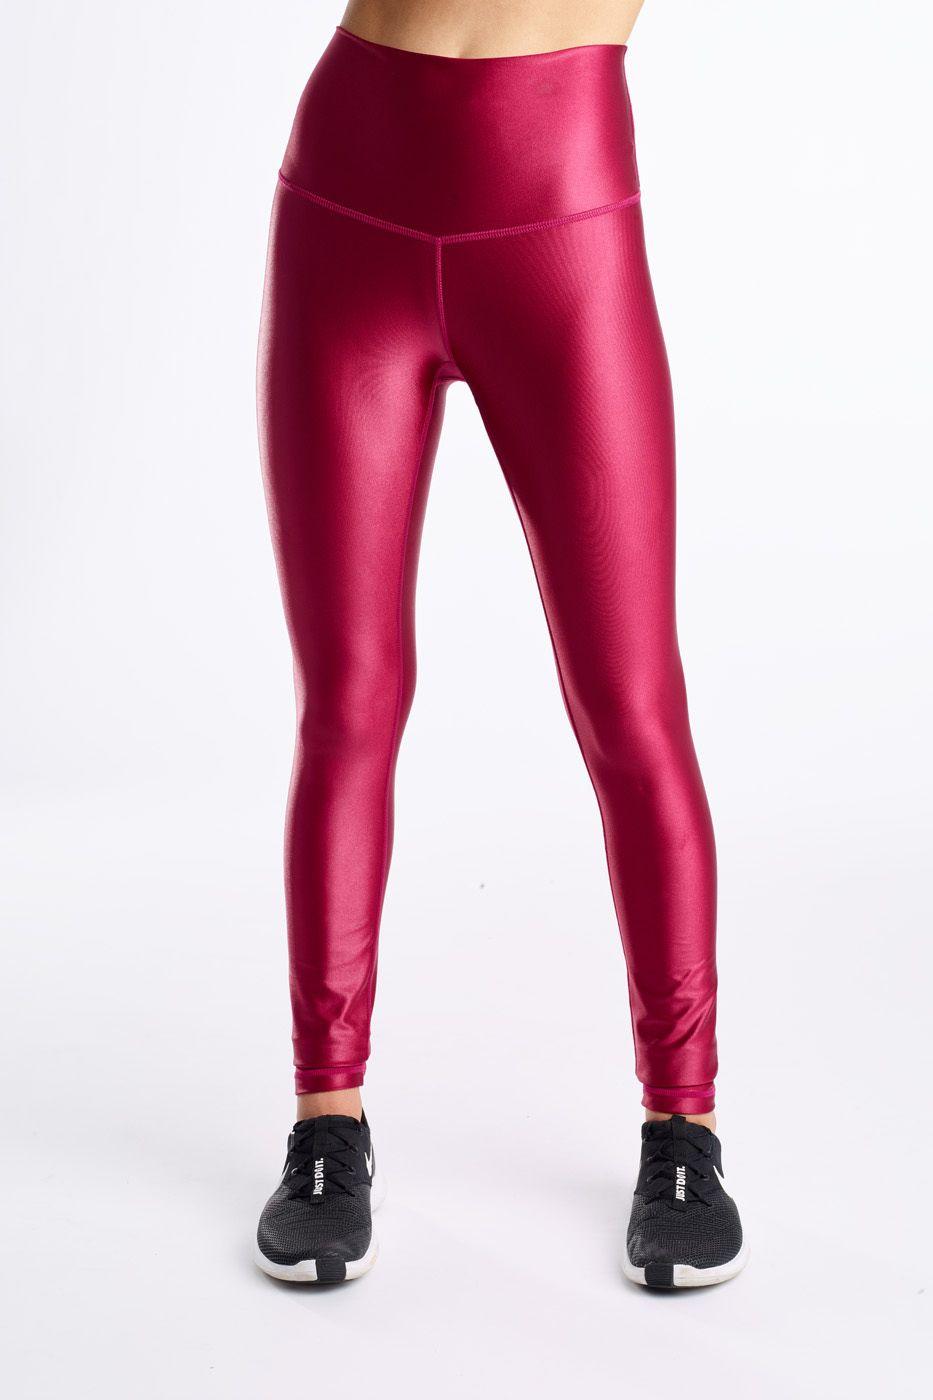 DYI High Shine Crimson Red Legging